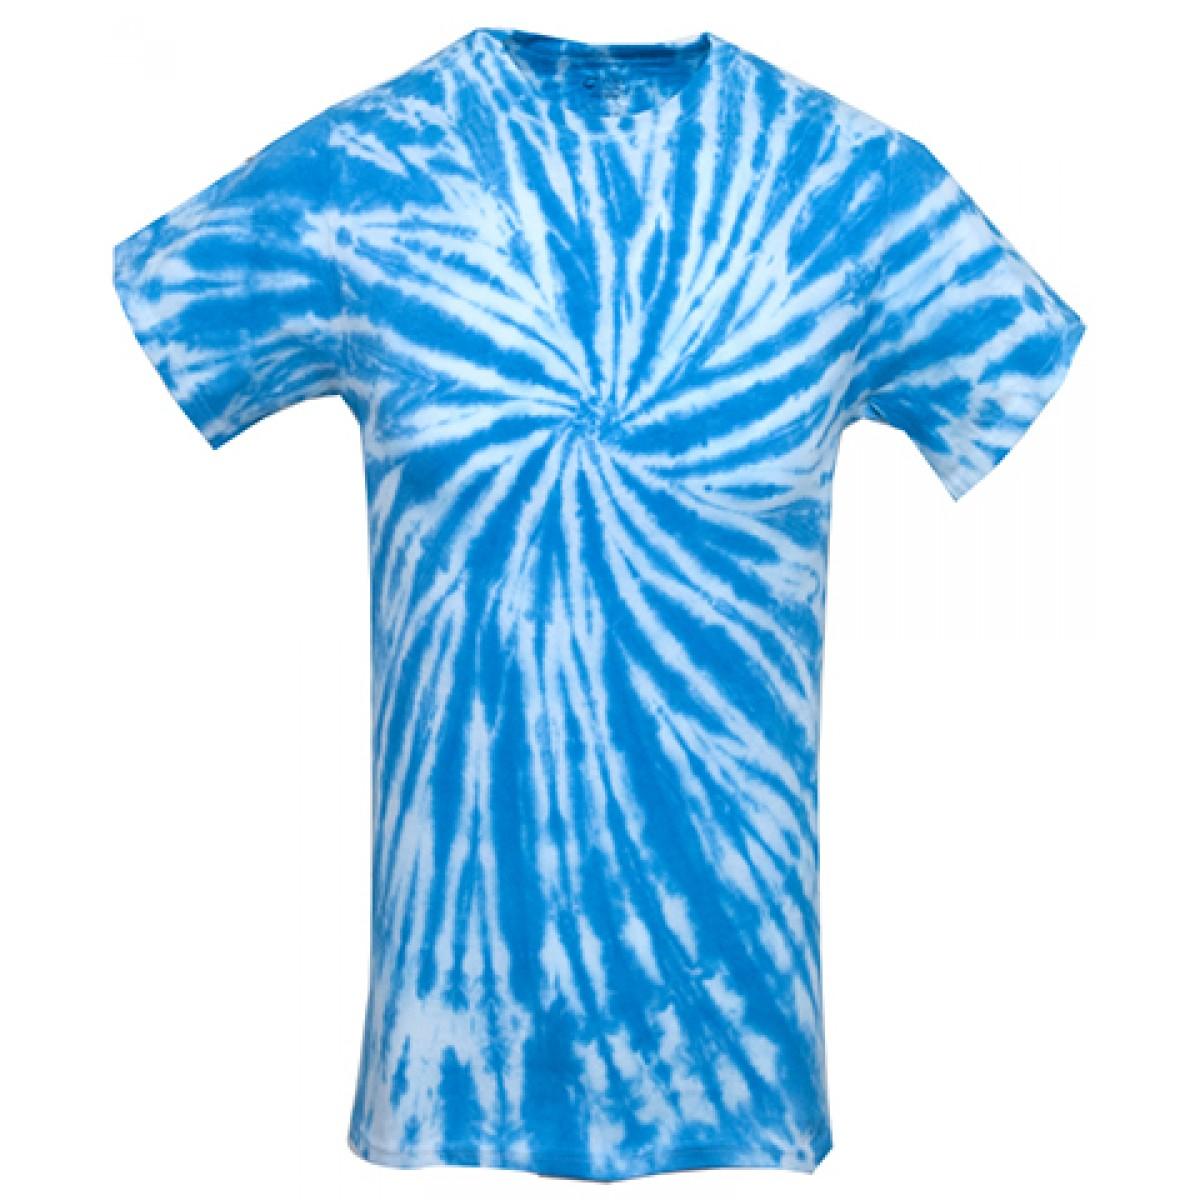 Tie-Dye Short Sleeve Shirts